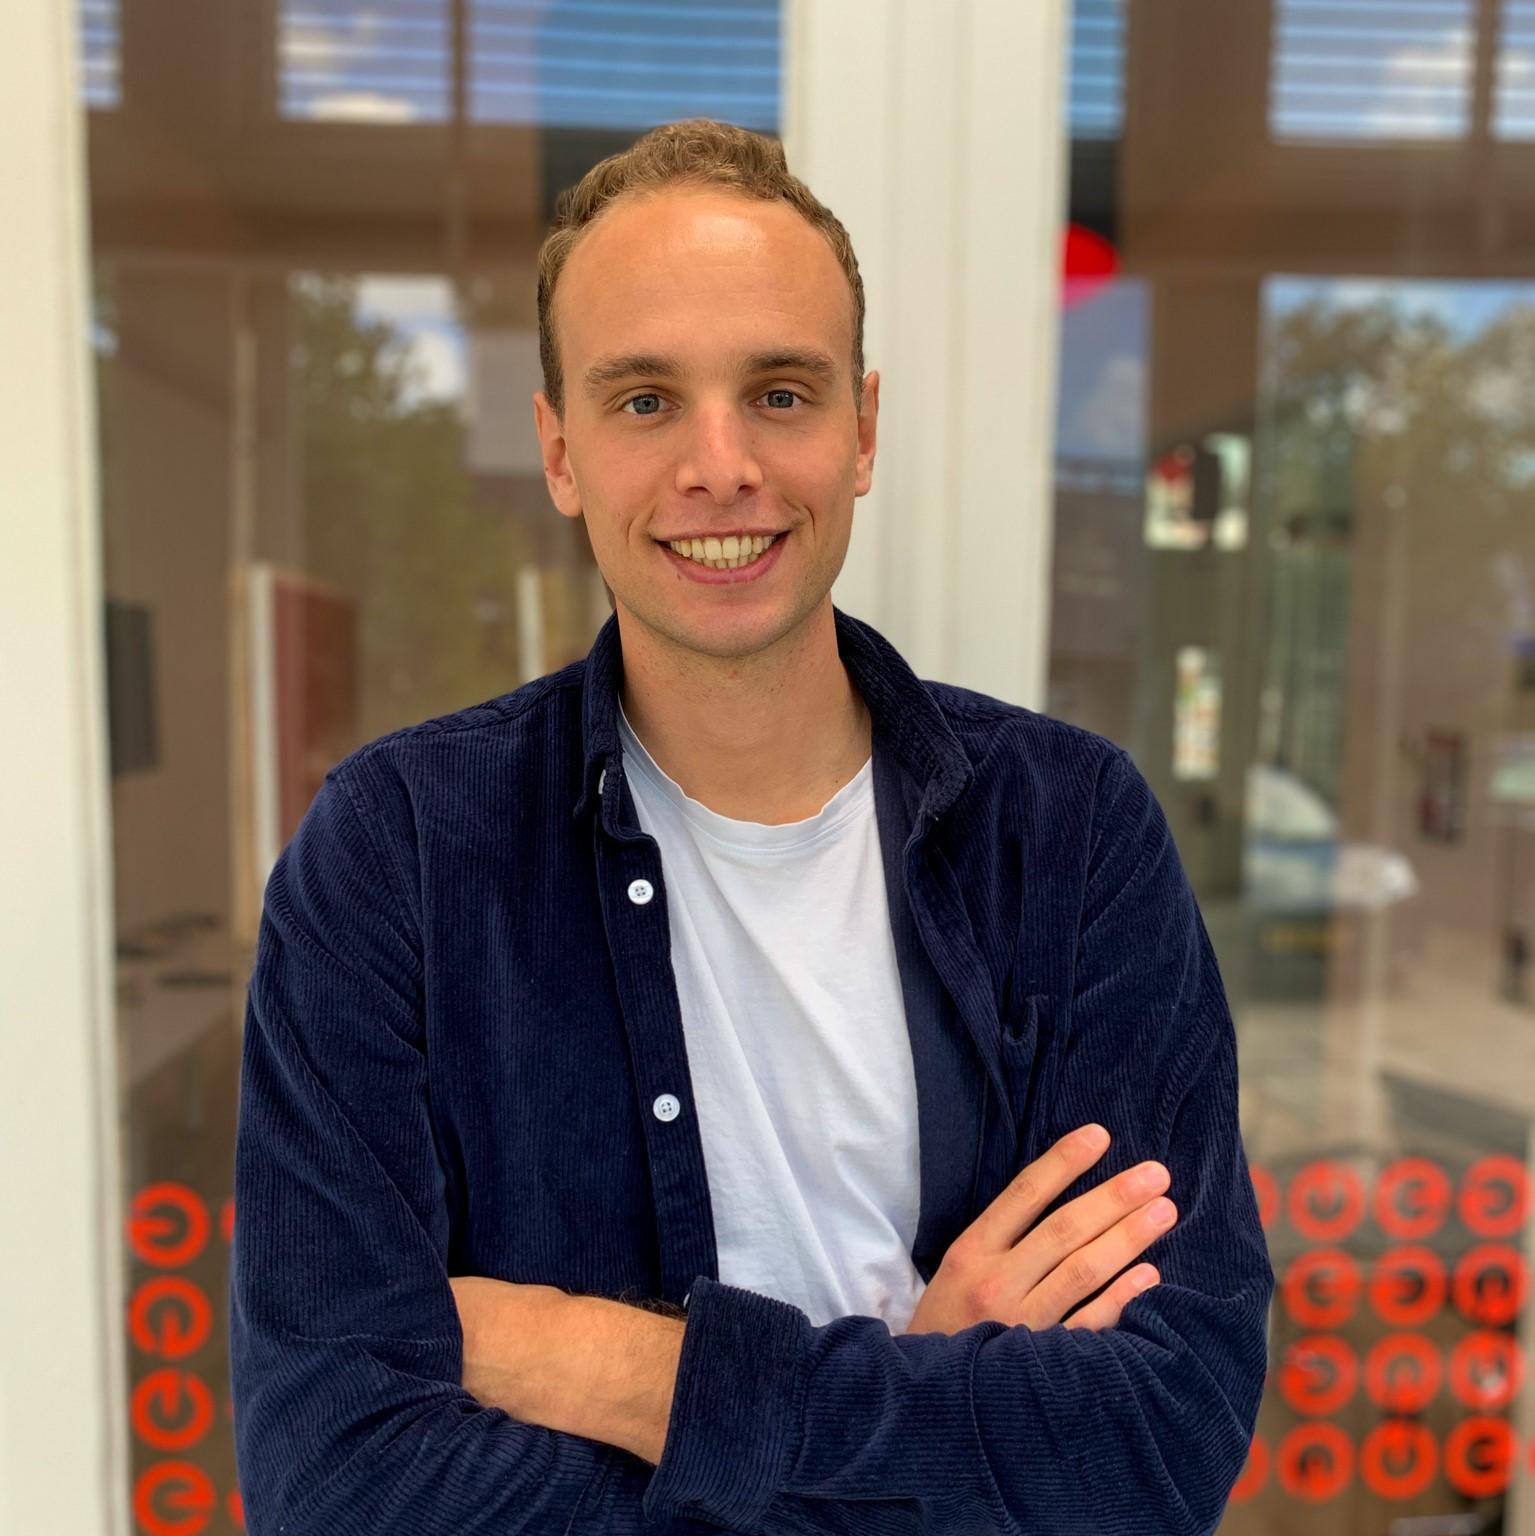 Sander Blokland